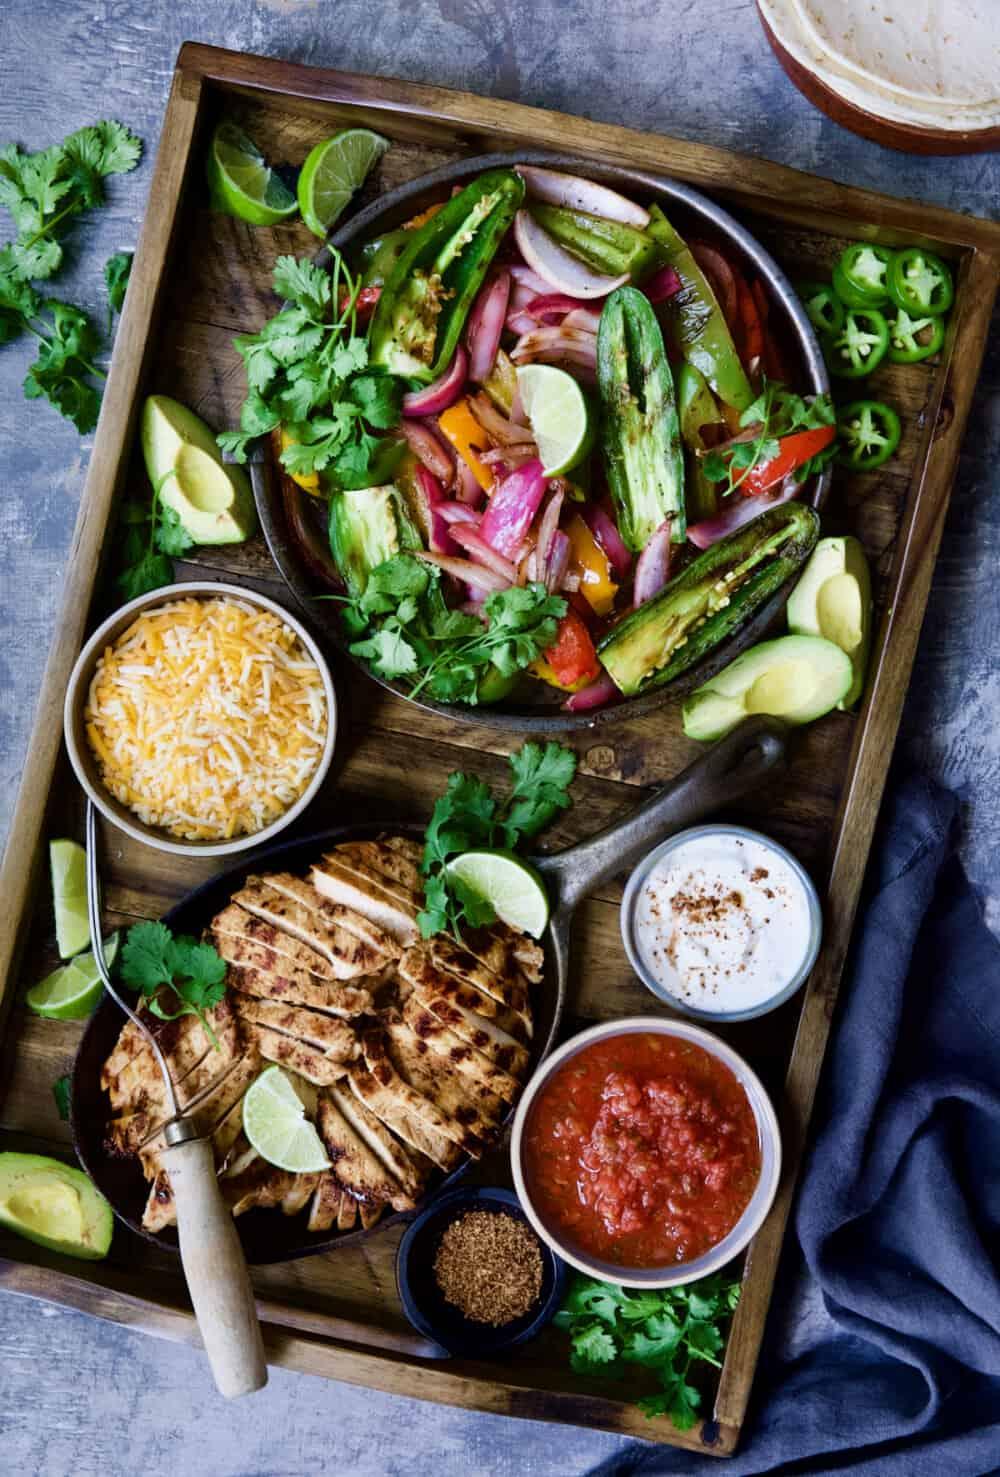 Grilled Tajin-Seasoned Chicken Fajitas on wood board with all the accompaniments.